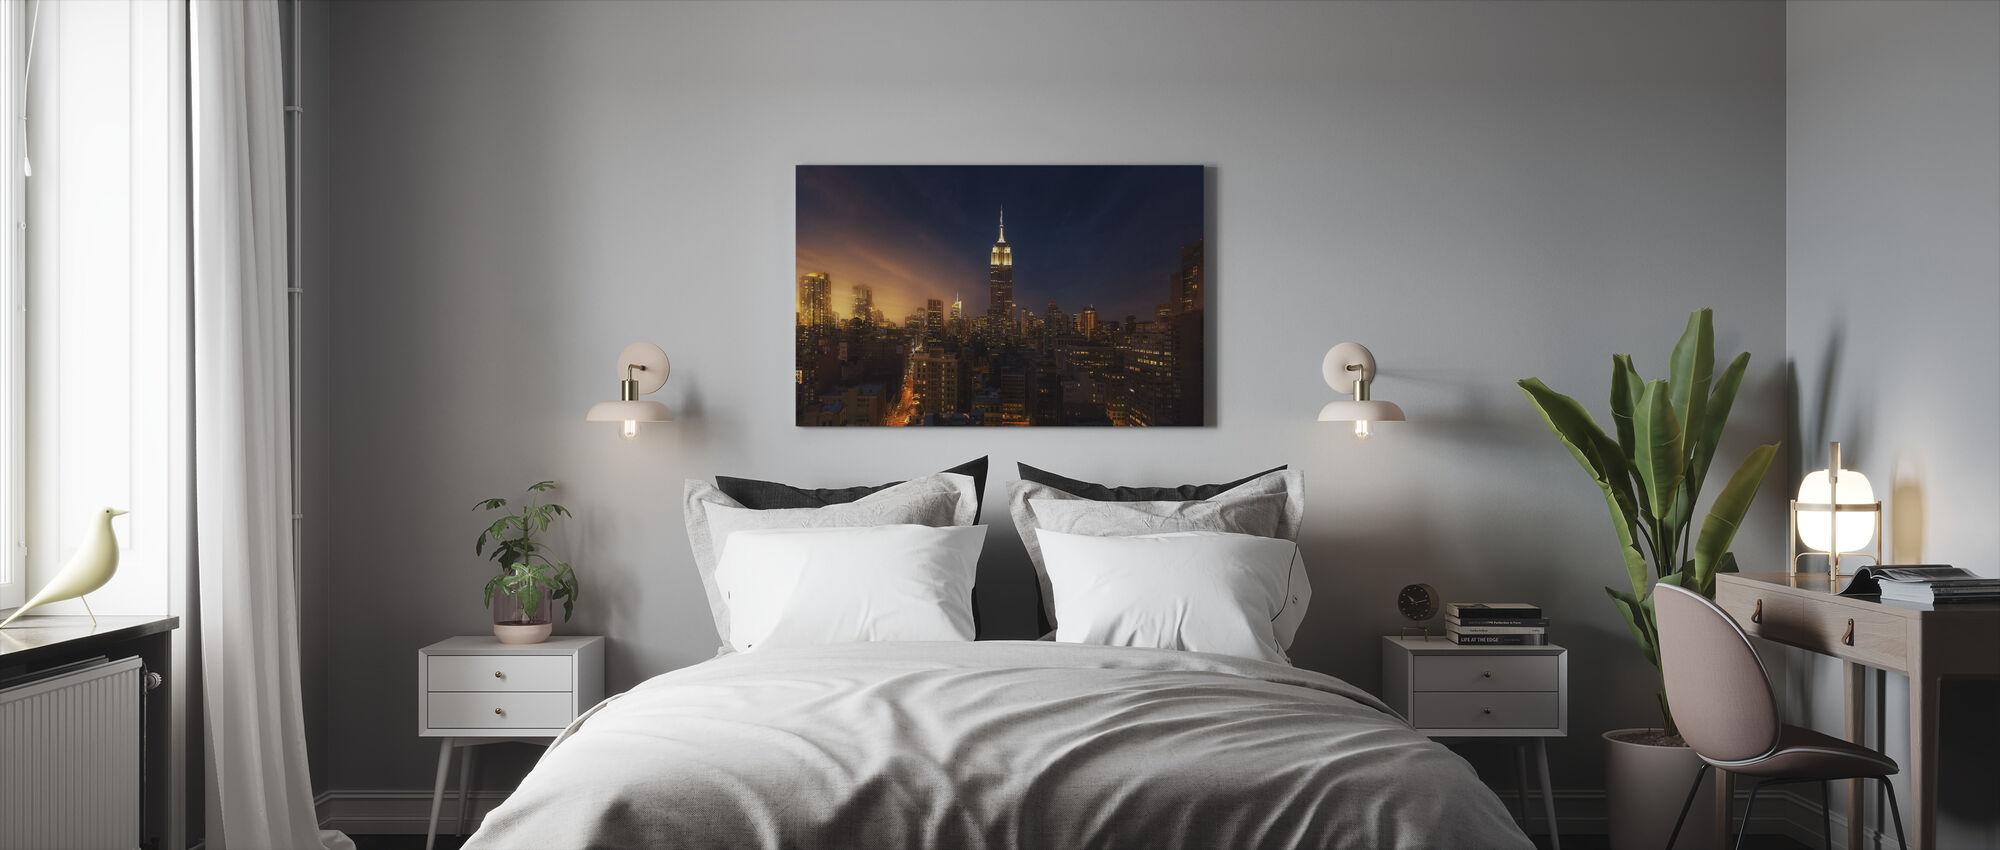 New Yorkin hehku - Canvastaulu - Makuuhuone